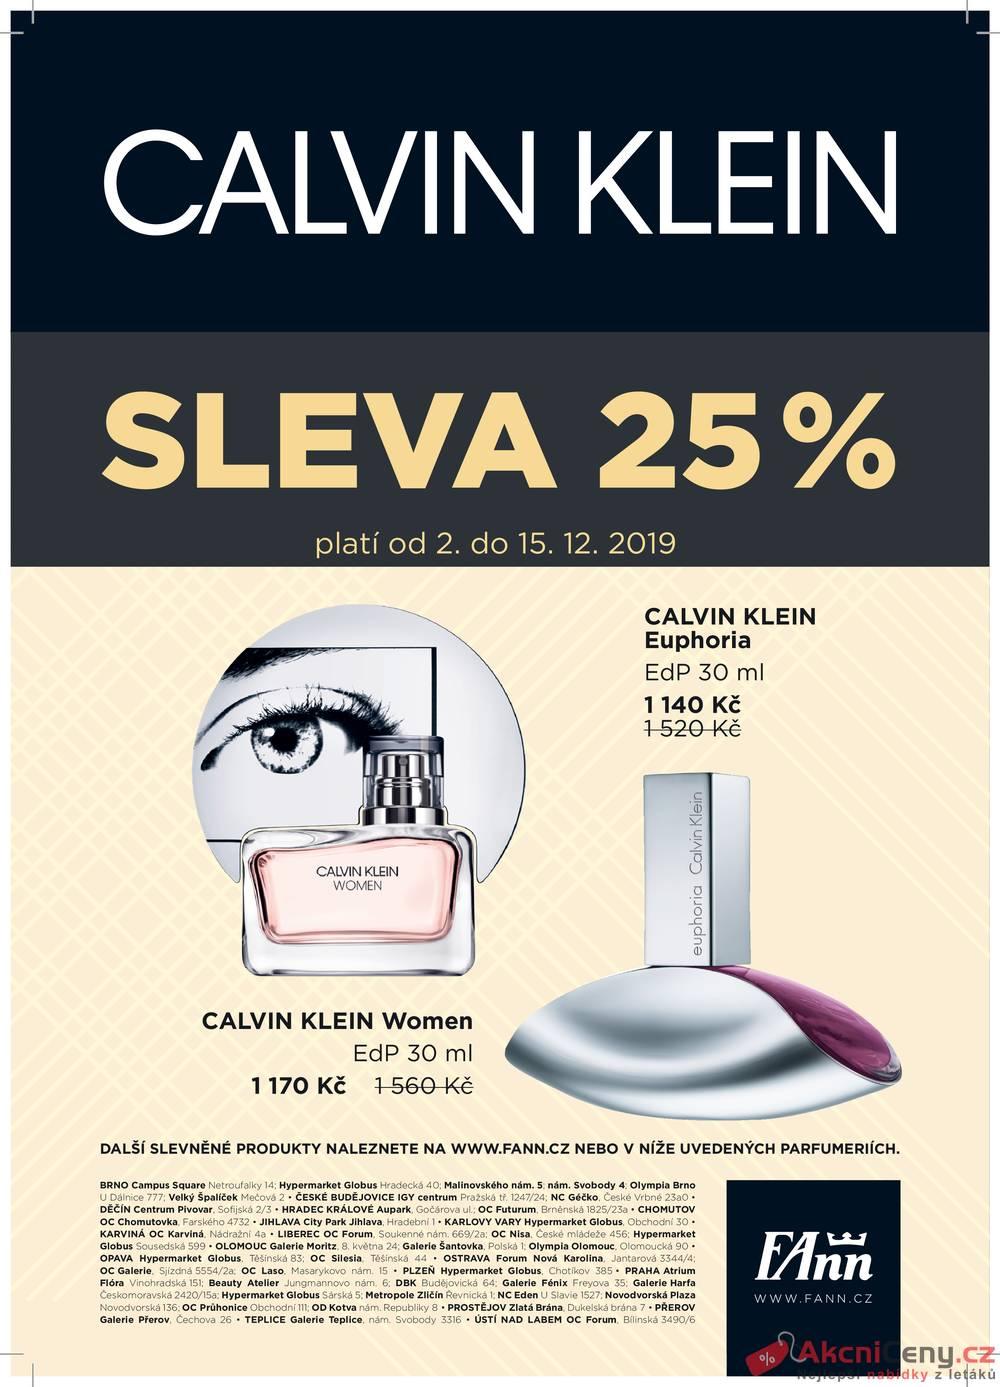 Leták FAnn parfumerie - FAnn Calvin Klein do 15.12. - strana 1